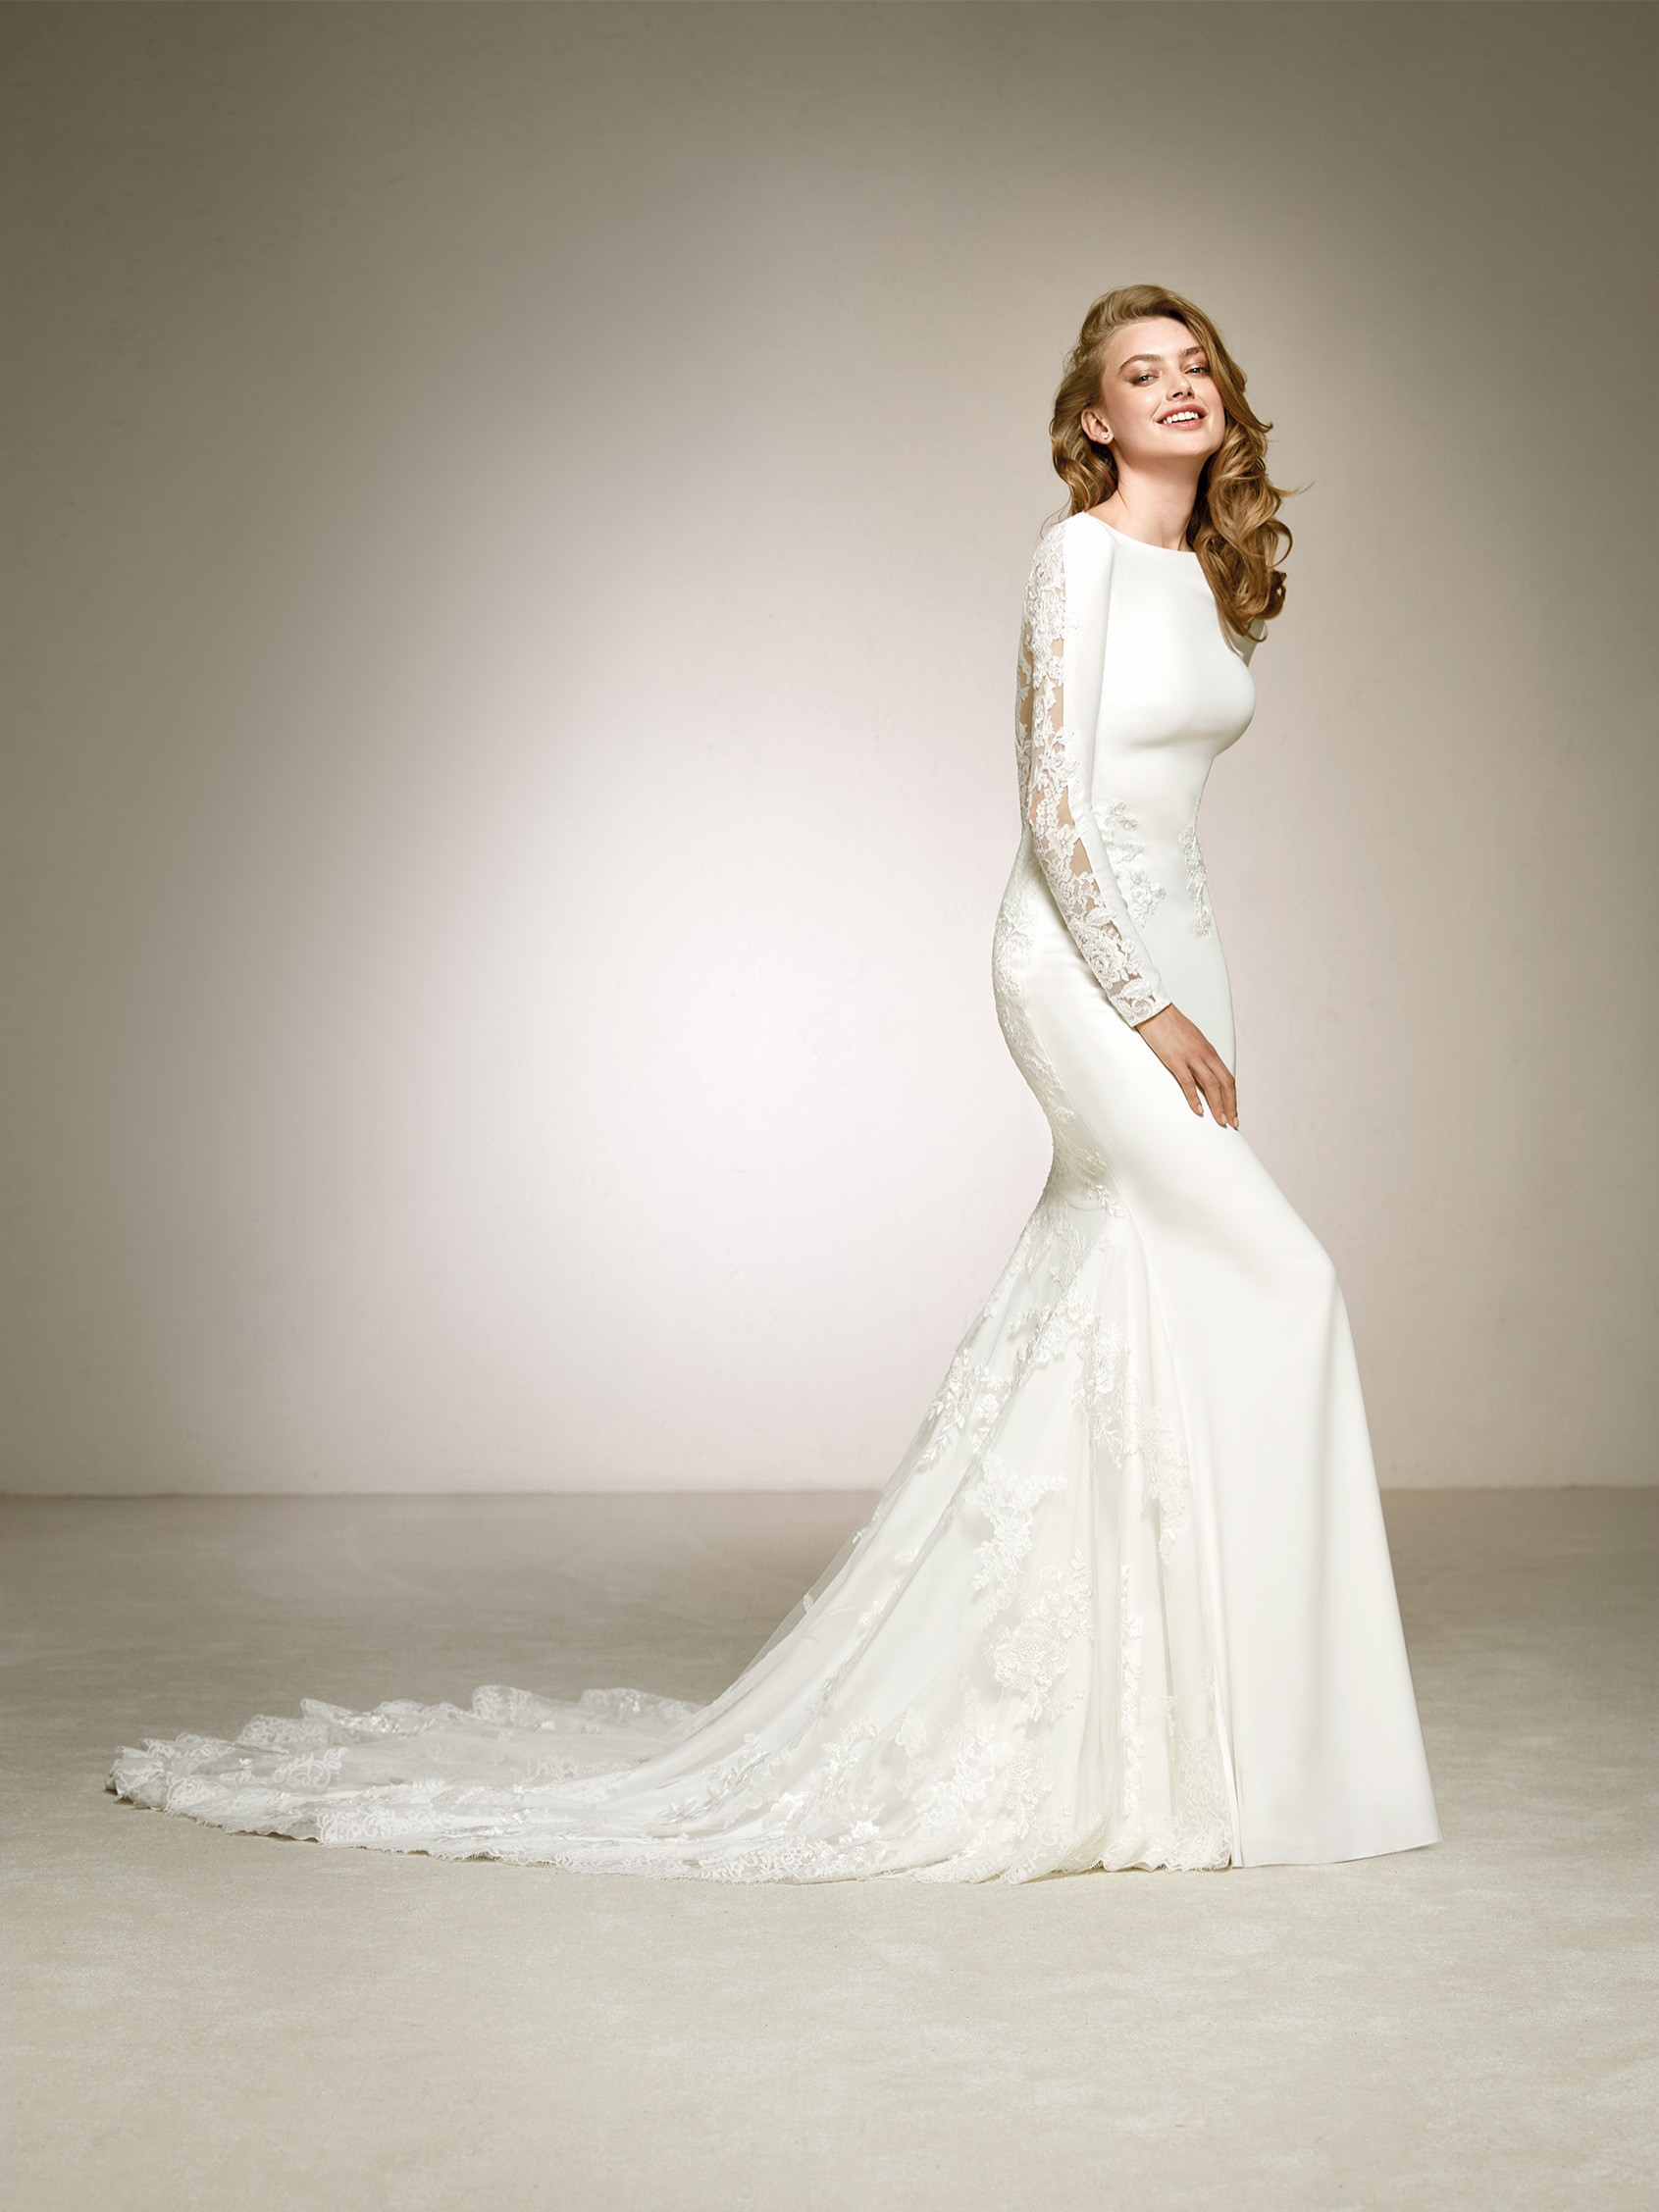 Swoon Wedding Dresses - Wedding Dresses In Redlands